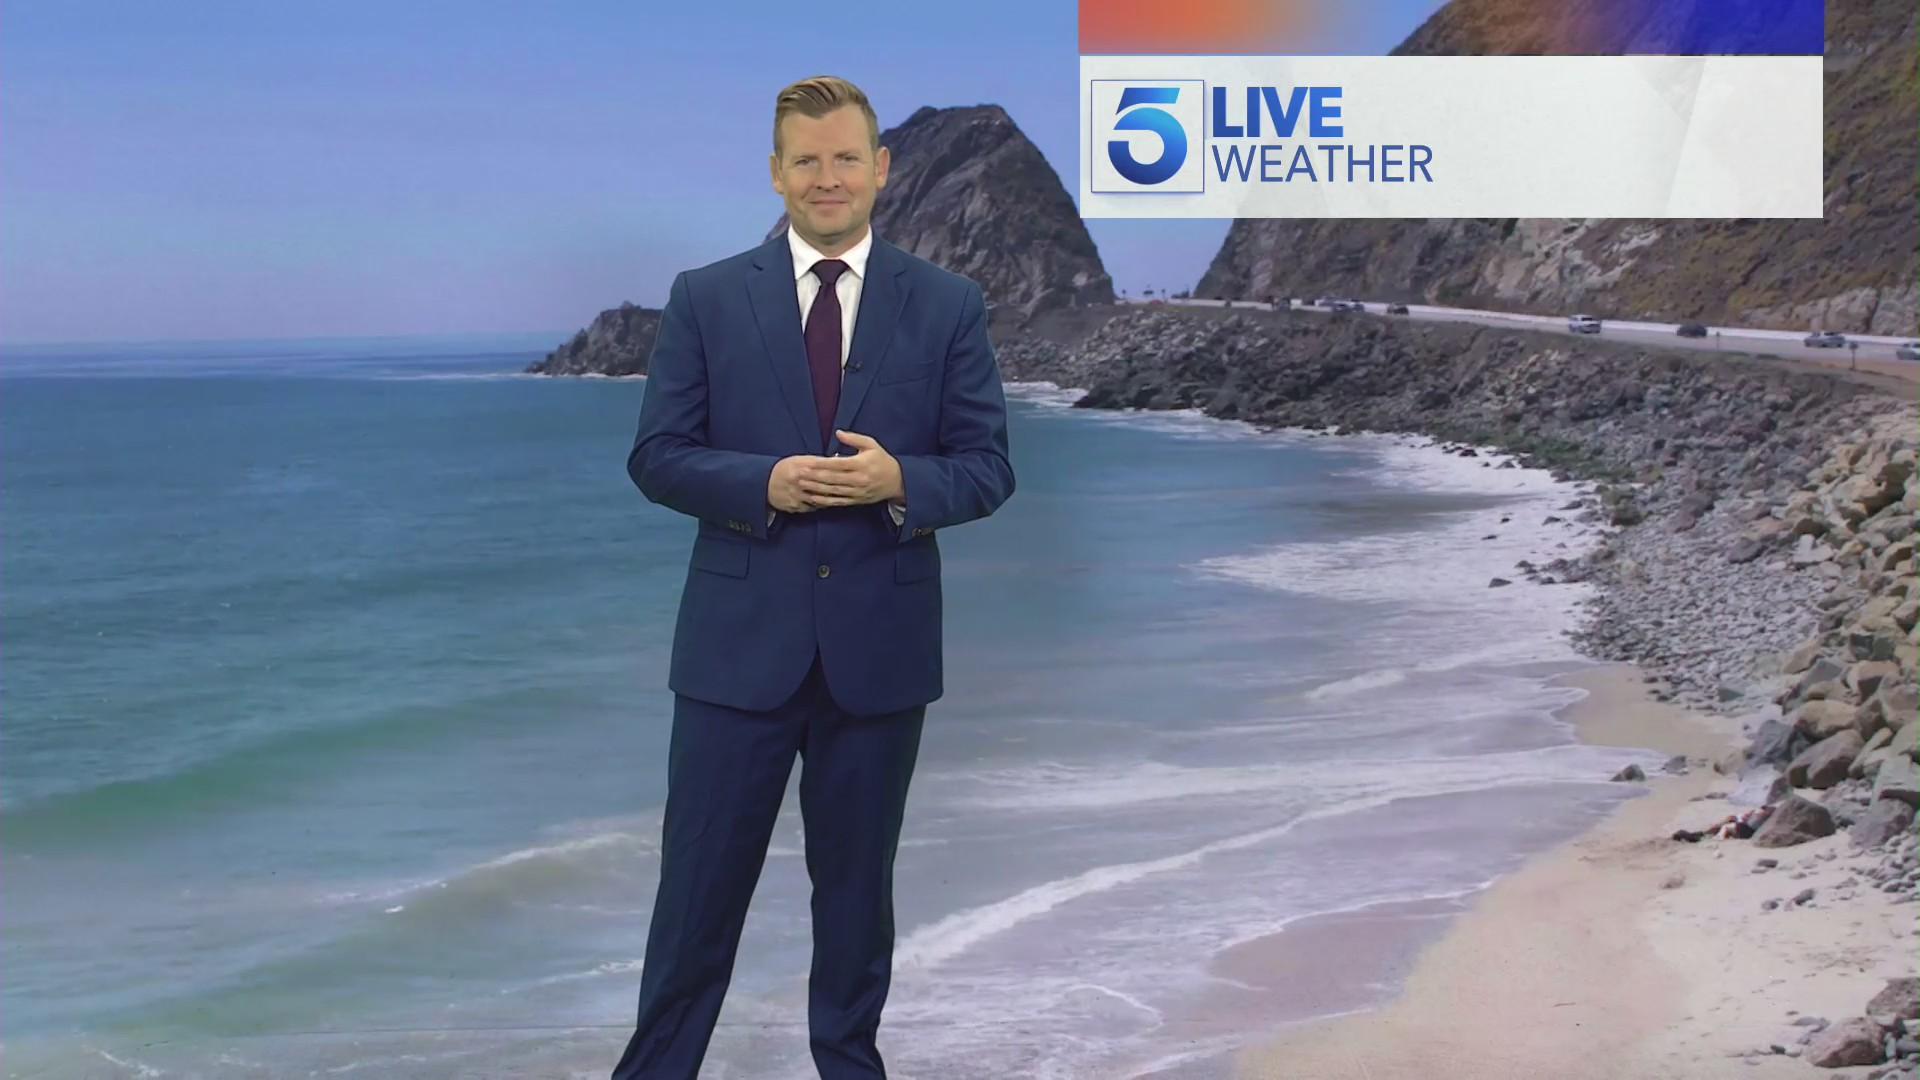 Kirk Hawkins reports the Thursday forecast on June 24, 2021. (KTLA)